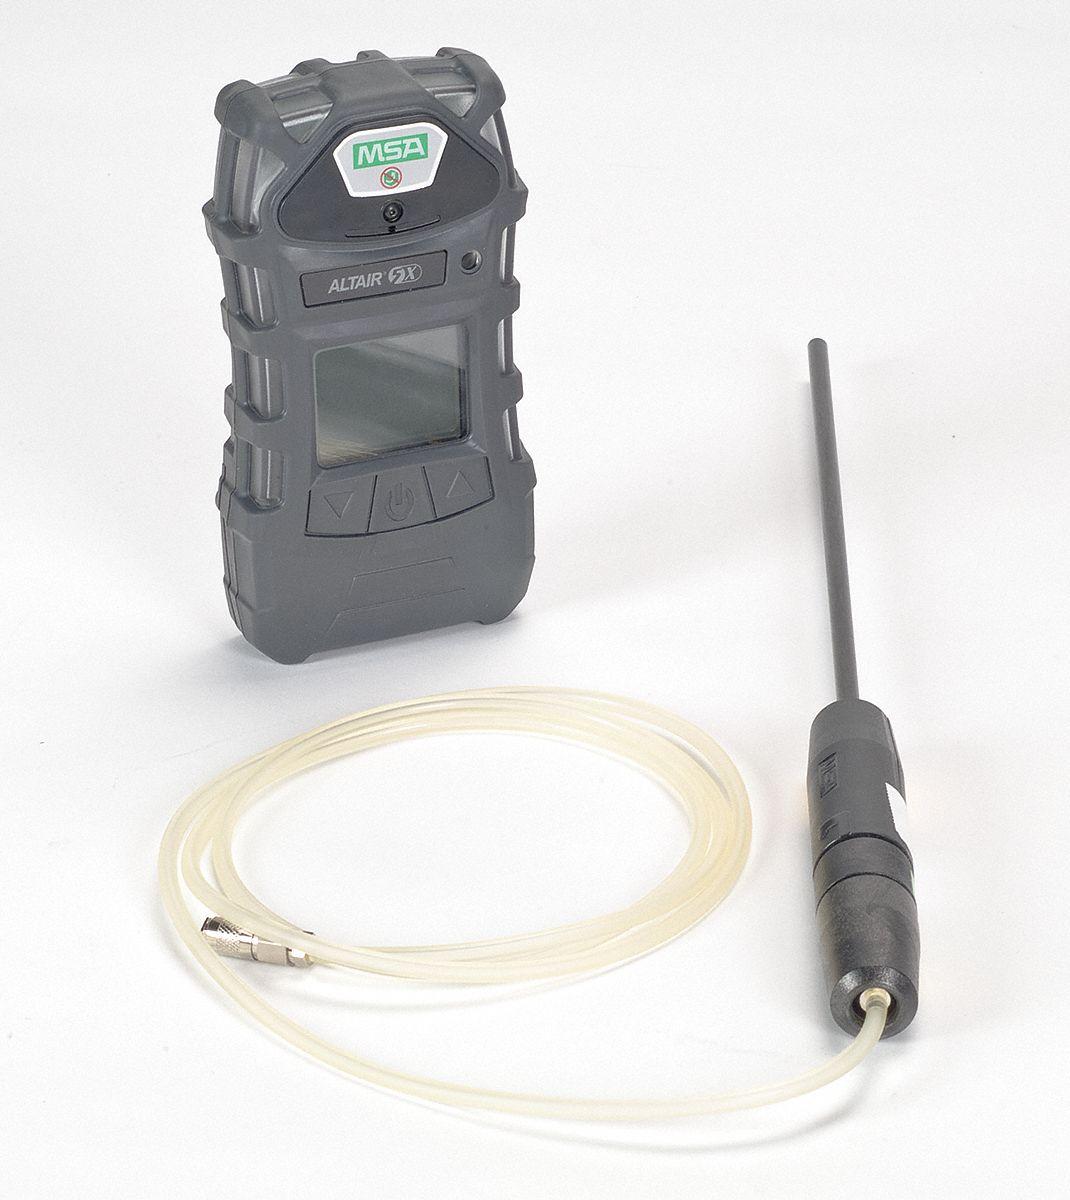 4 Gas Meter : Msa multi gas detector to f lcd rpz